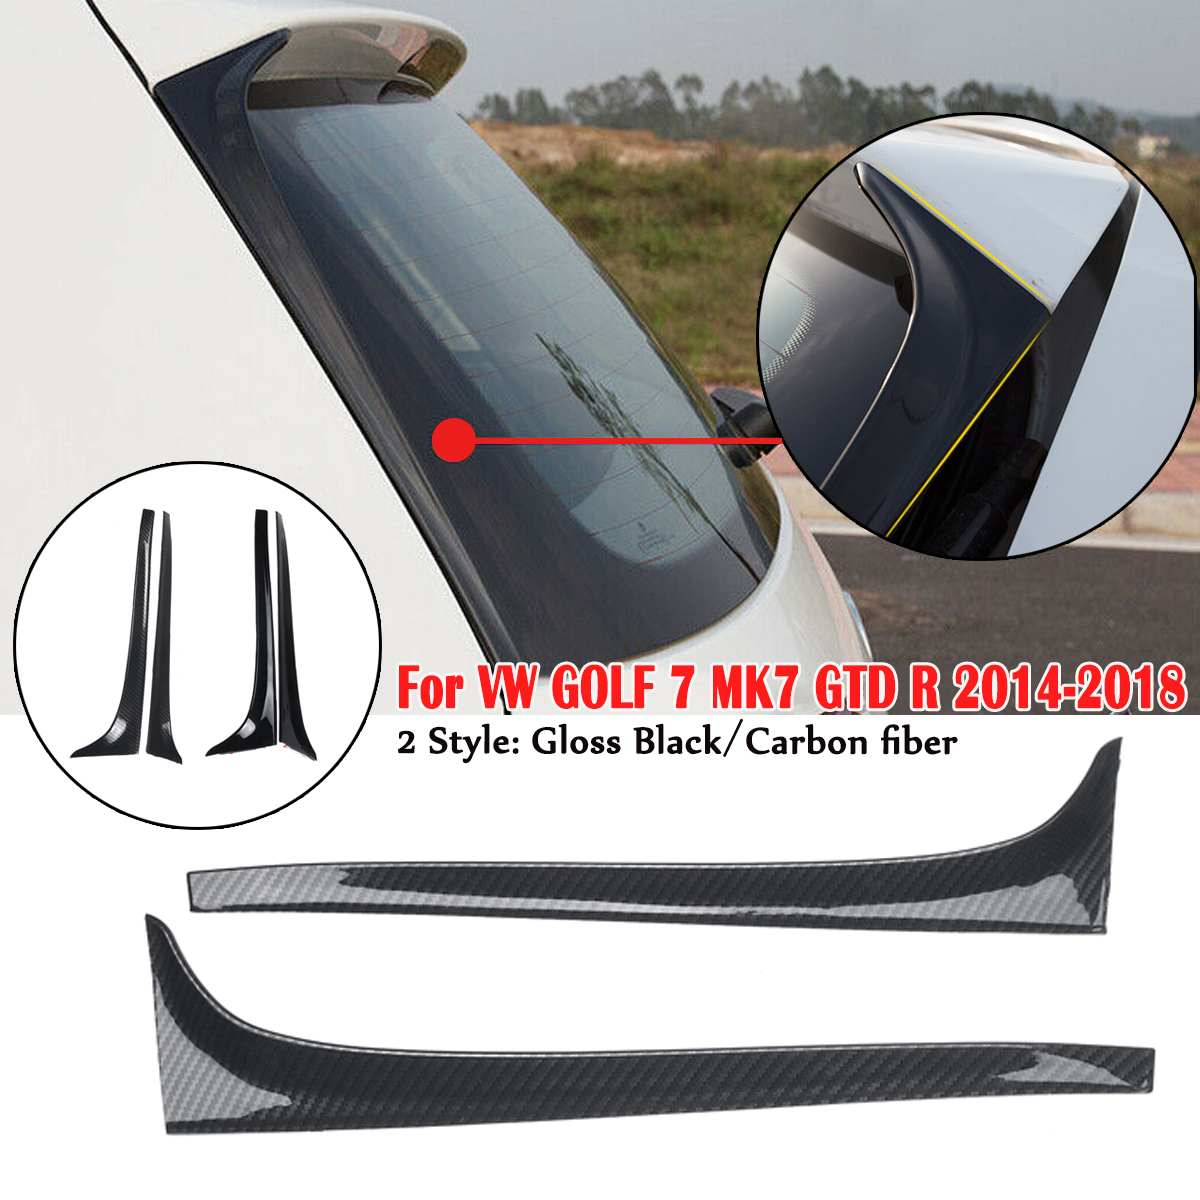 Fibra de carbono janela traseira lateral spoiler asa para vw golf 7 mk7 gtd r 2014-2018 carro-estilo acessórios de automóveis